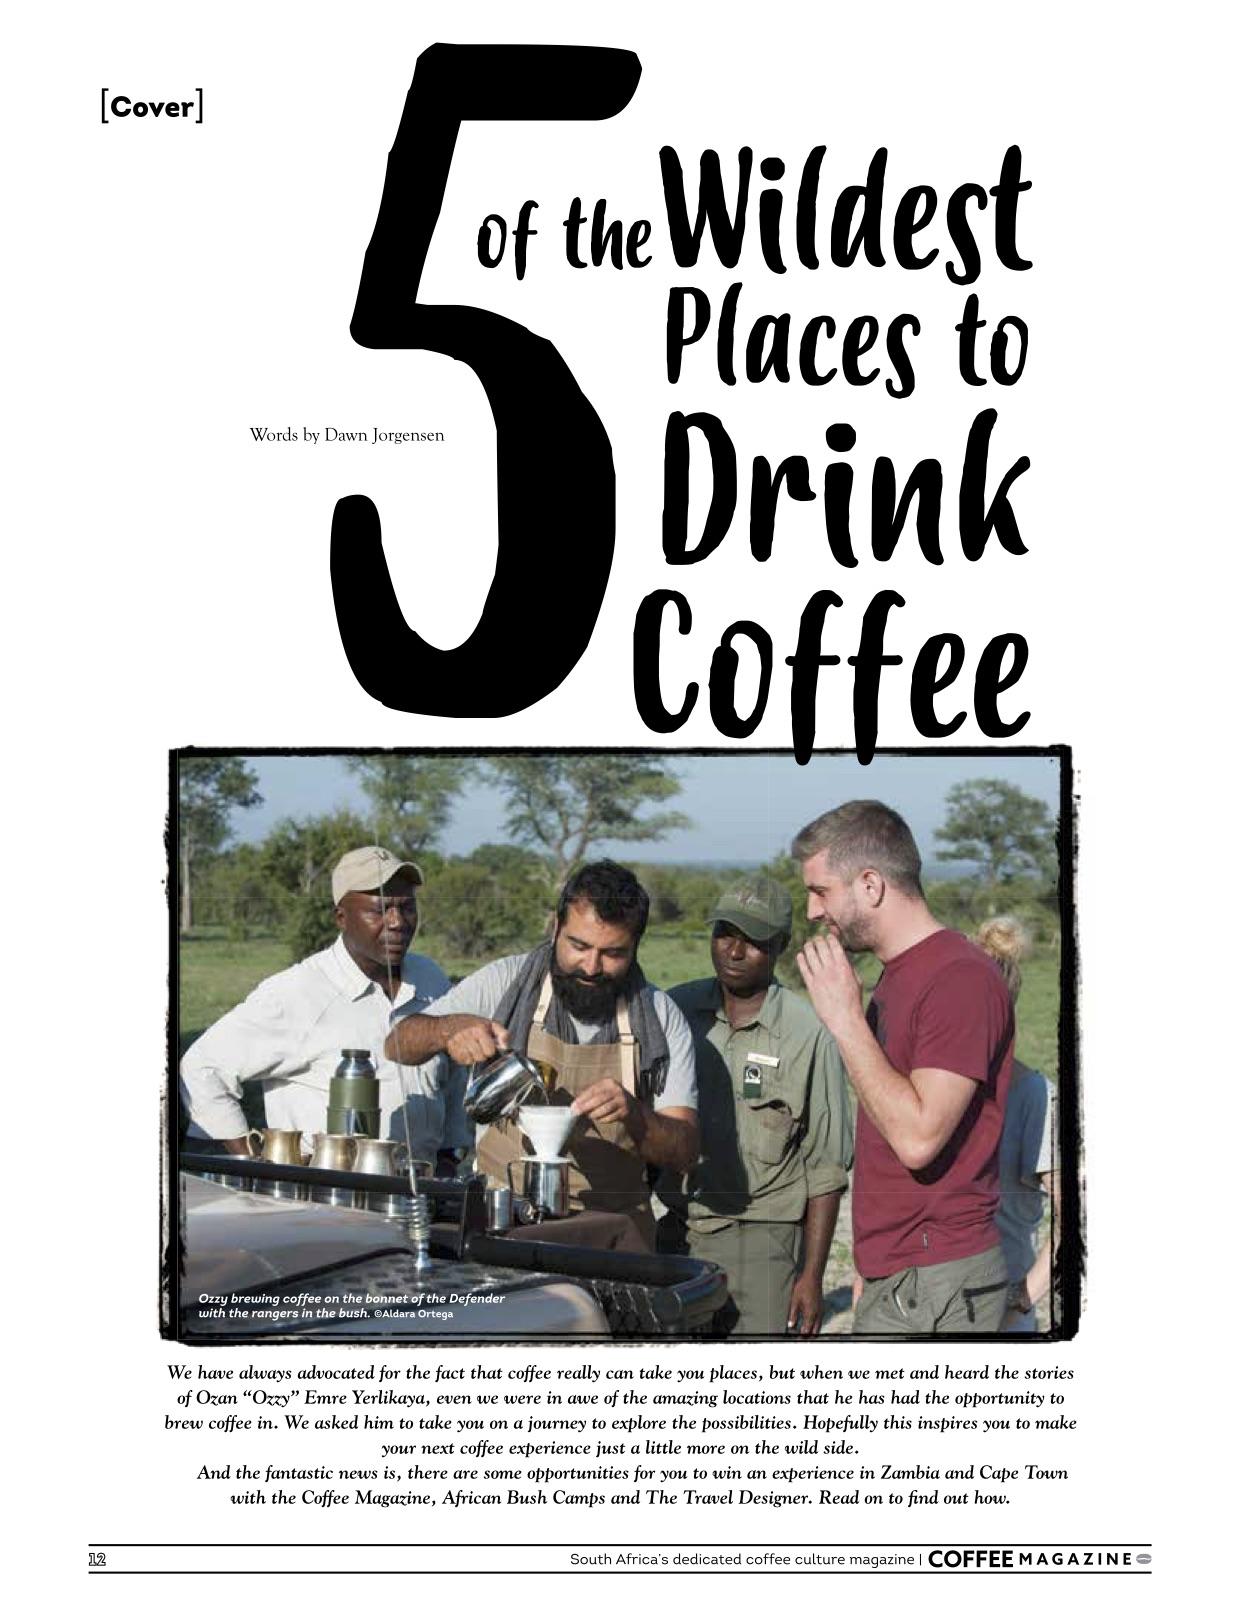 Travel Designer Coffee Magazine